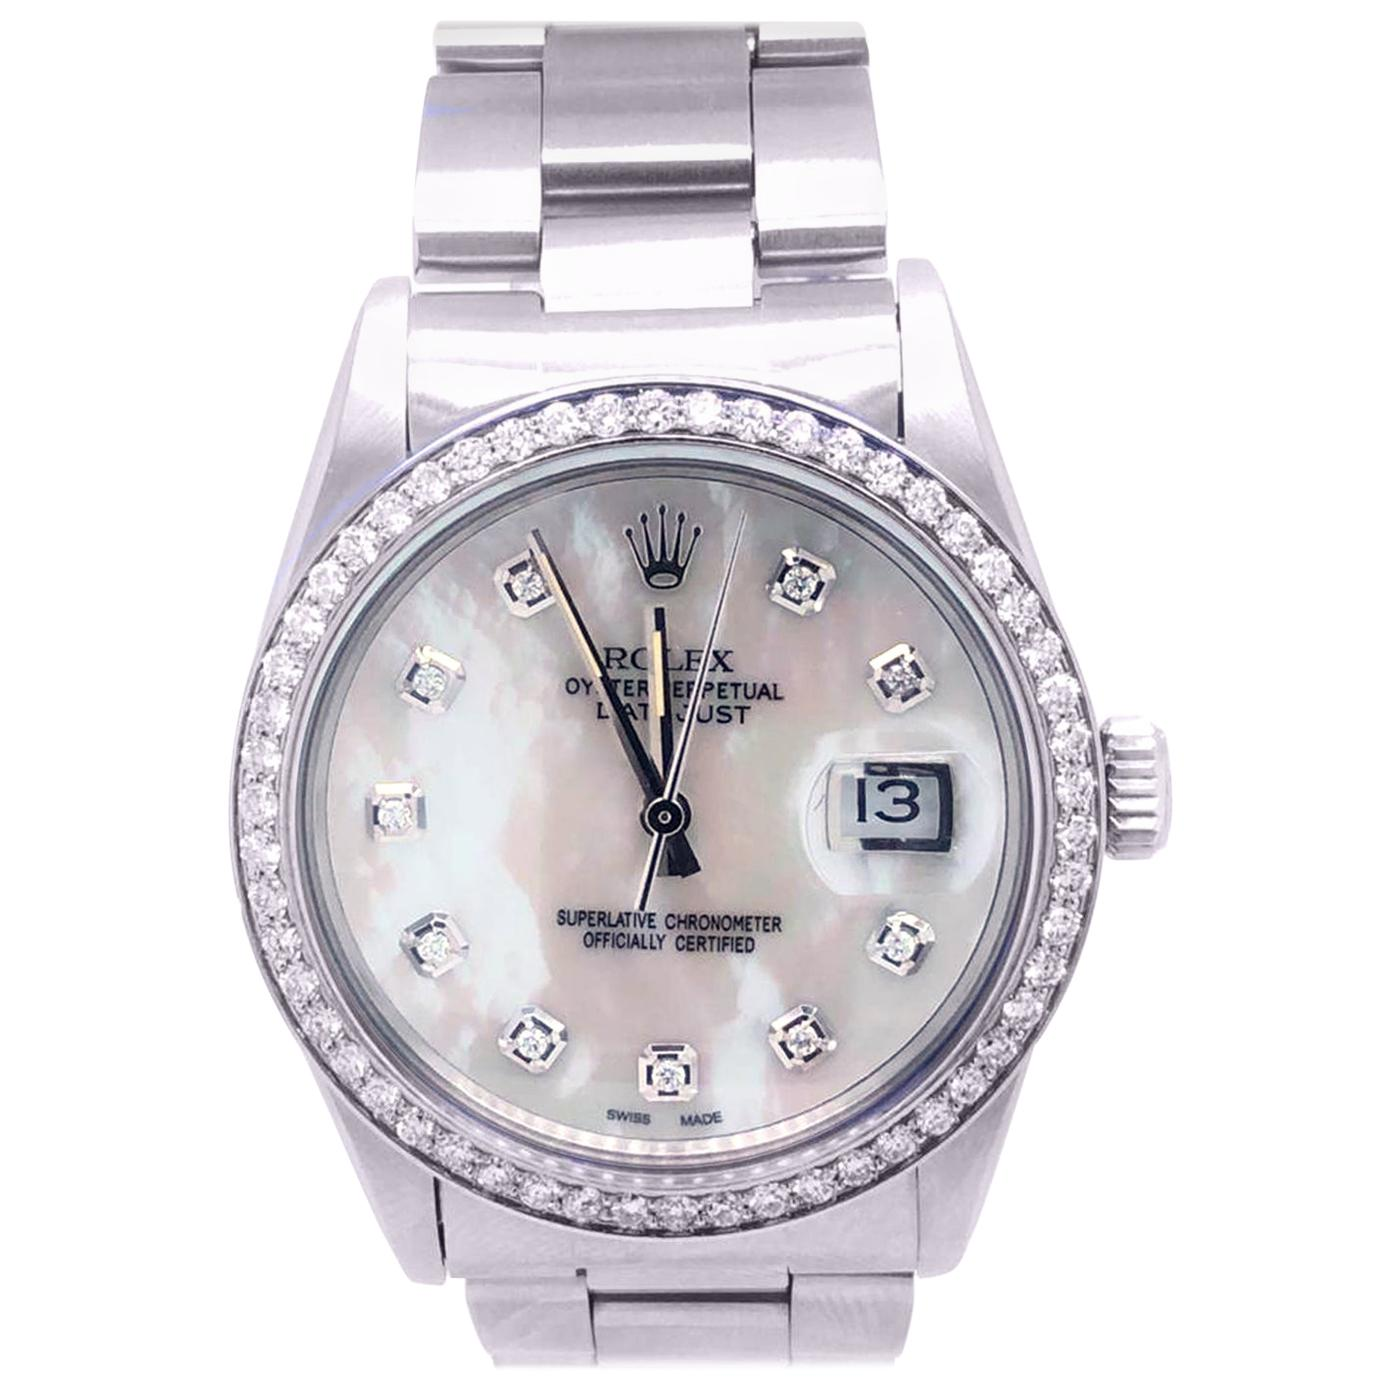 Rolex Datejust 16200 Men's Stainless Steel Mother of Pearl Diamond Bezel Watch